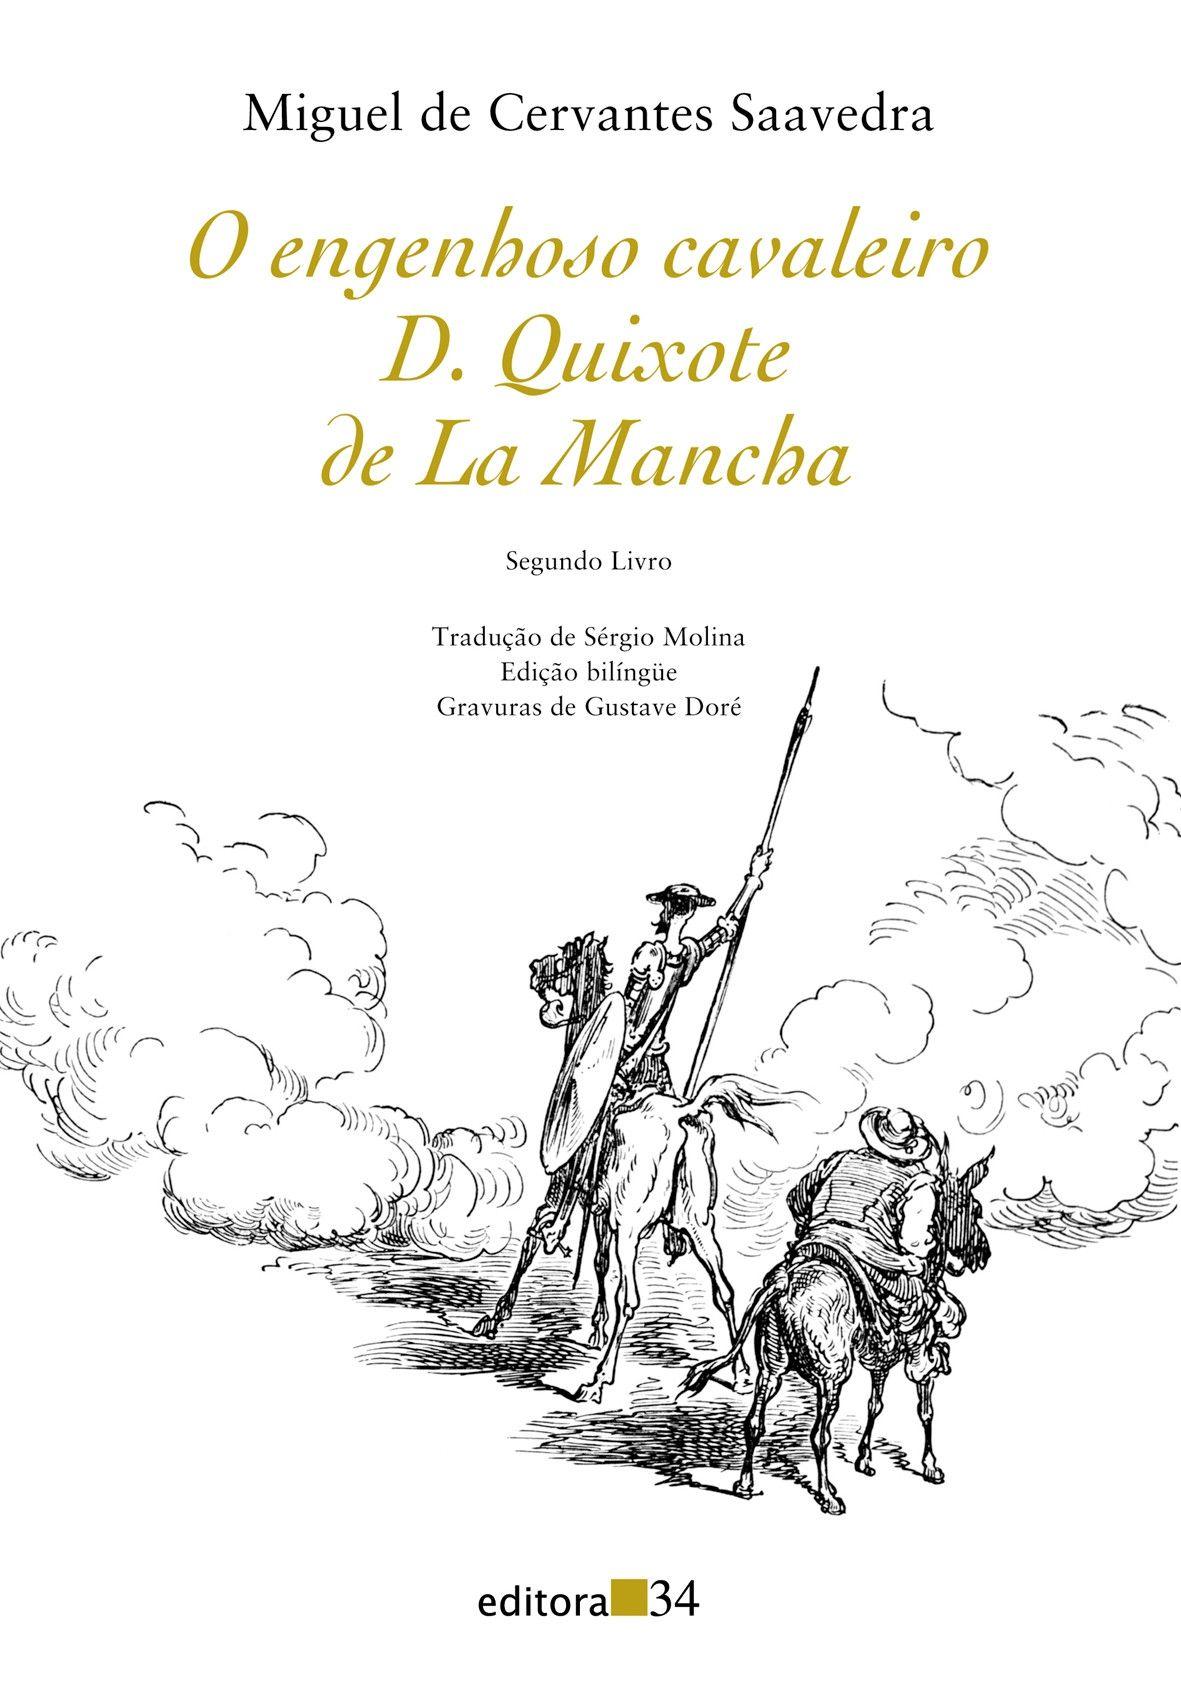 Engenhoso fidalgo Dom Quixote de la Mancha, O - Segundo livro